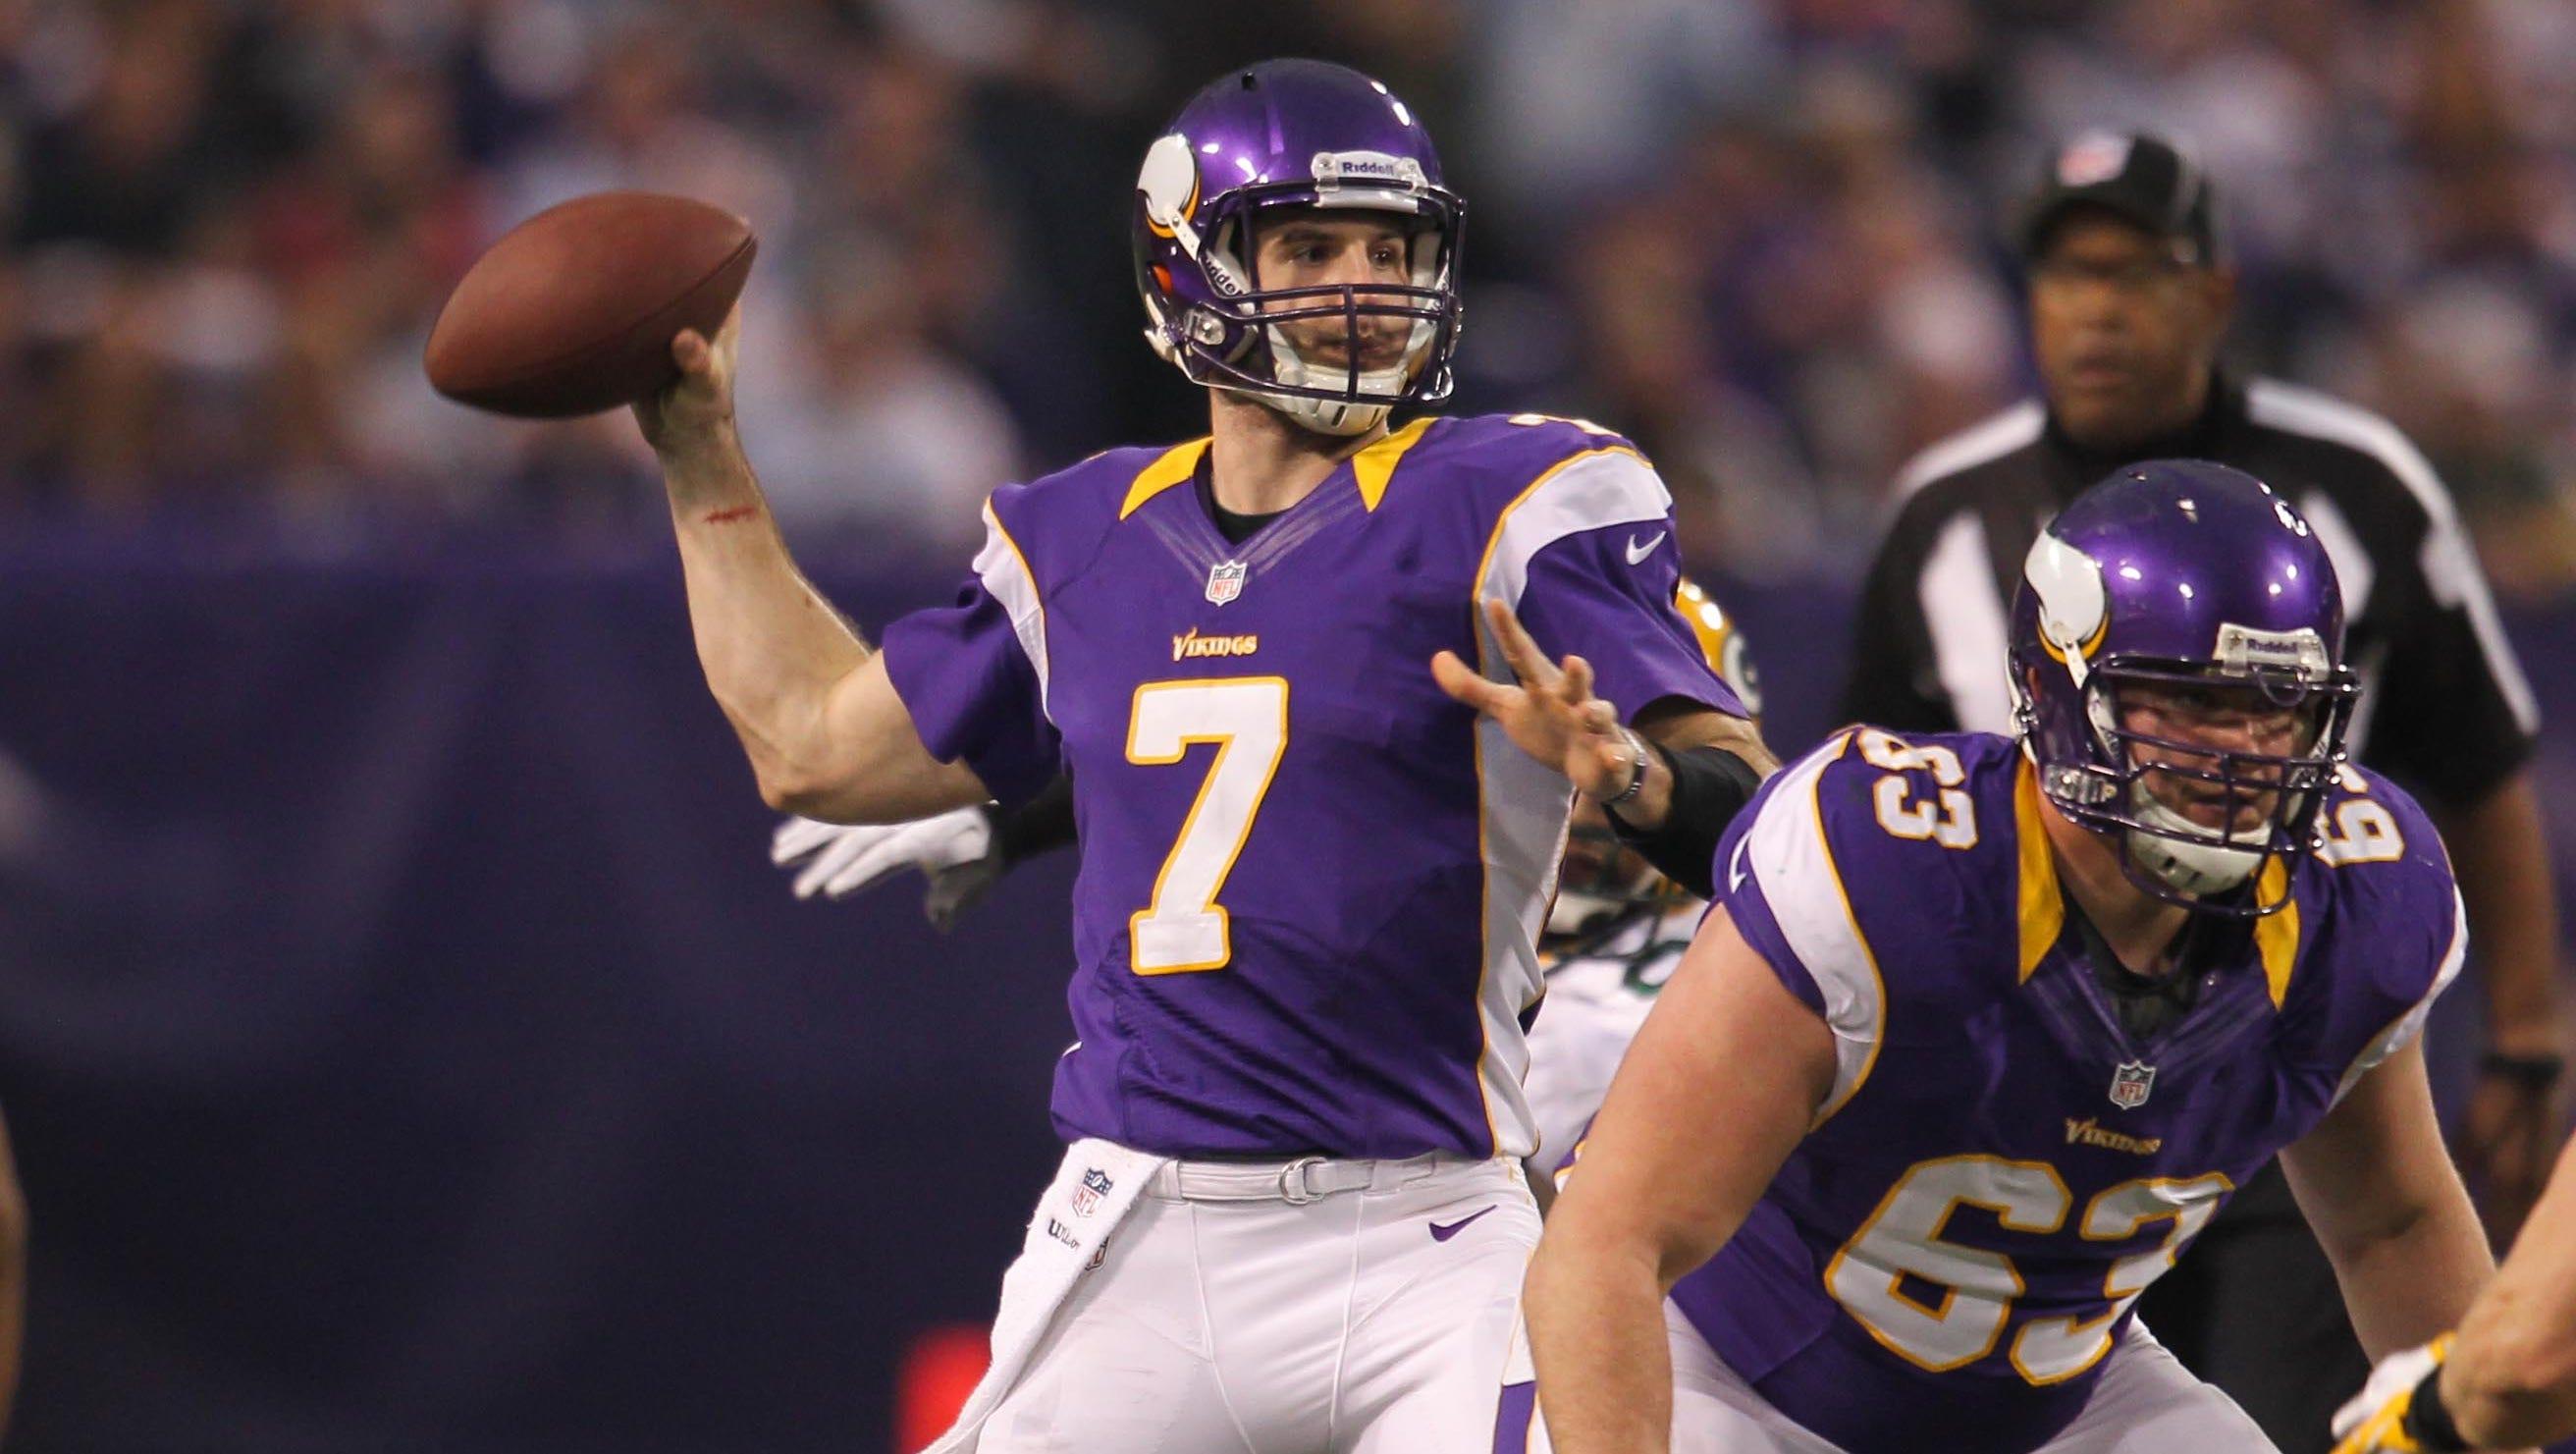 27. Christian Ponder, Minnesota Vikings